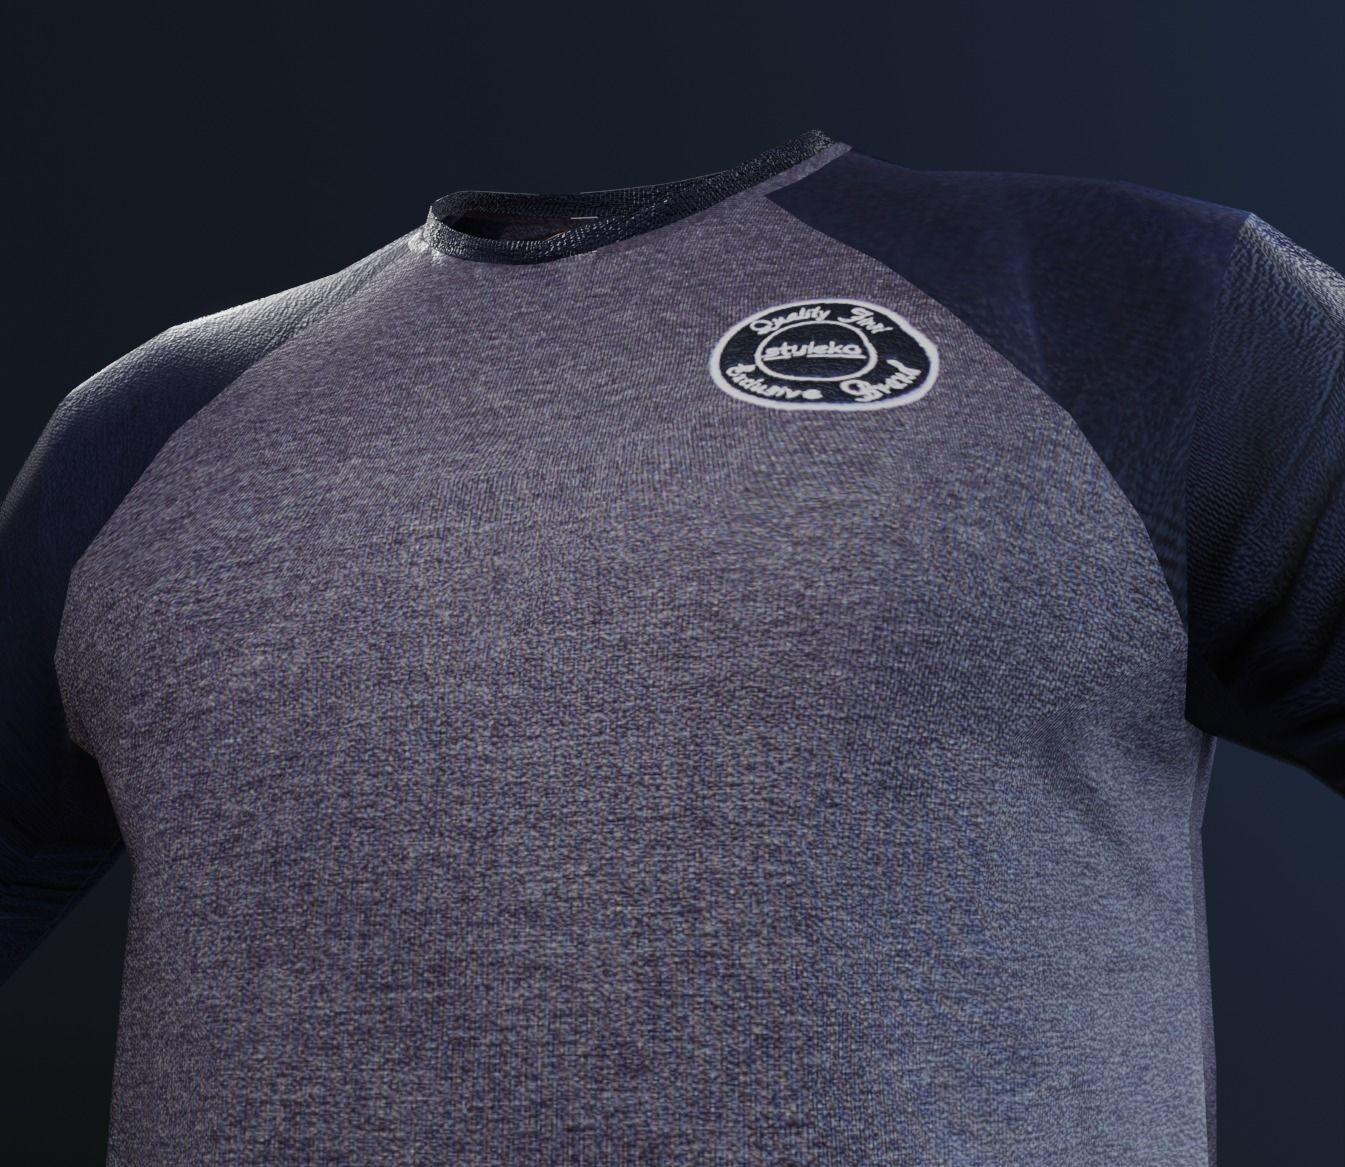 3d t shirt model animation